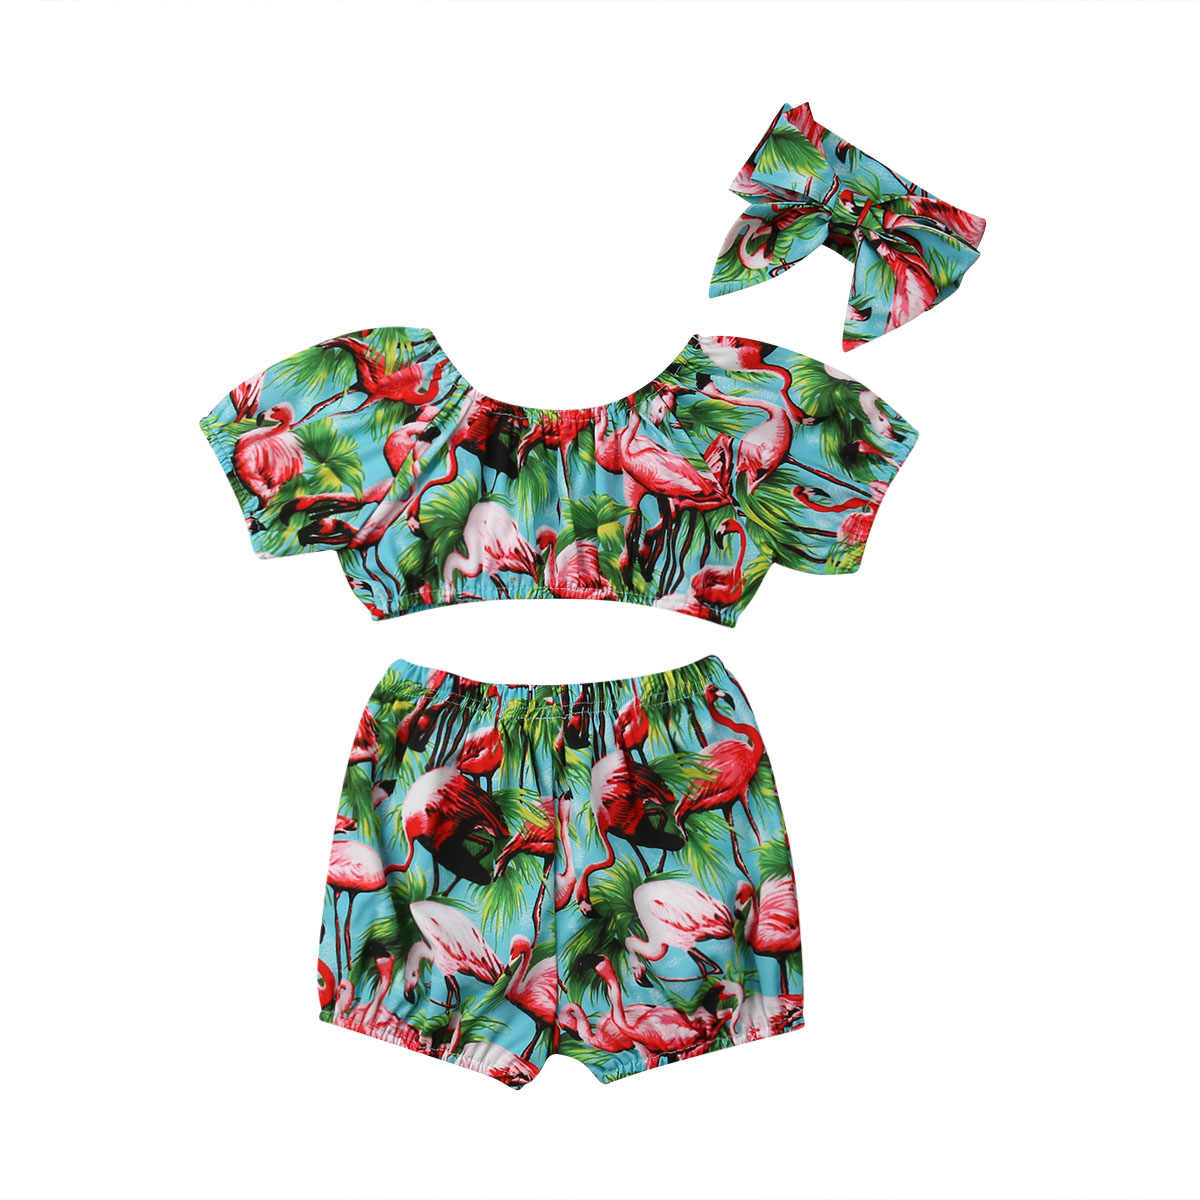 81746e73e148 Detail Feedback Questions about 2019 Summer Toddler Kids Baby Girl Flamingo  Clothes Short Sleeve Tank Tops High Waist Shorts Headband 3PCS Girls  Clothing ...